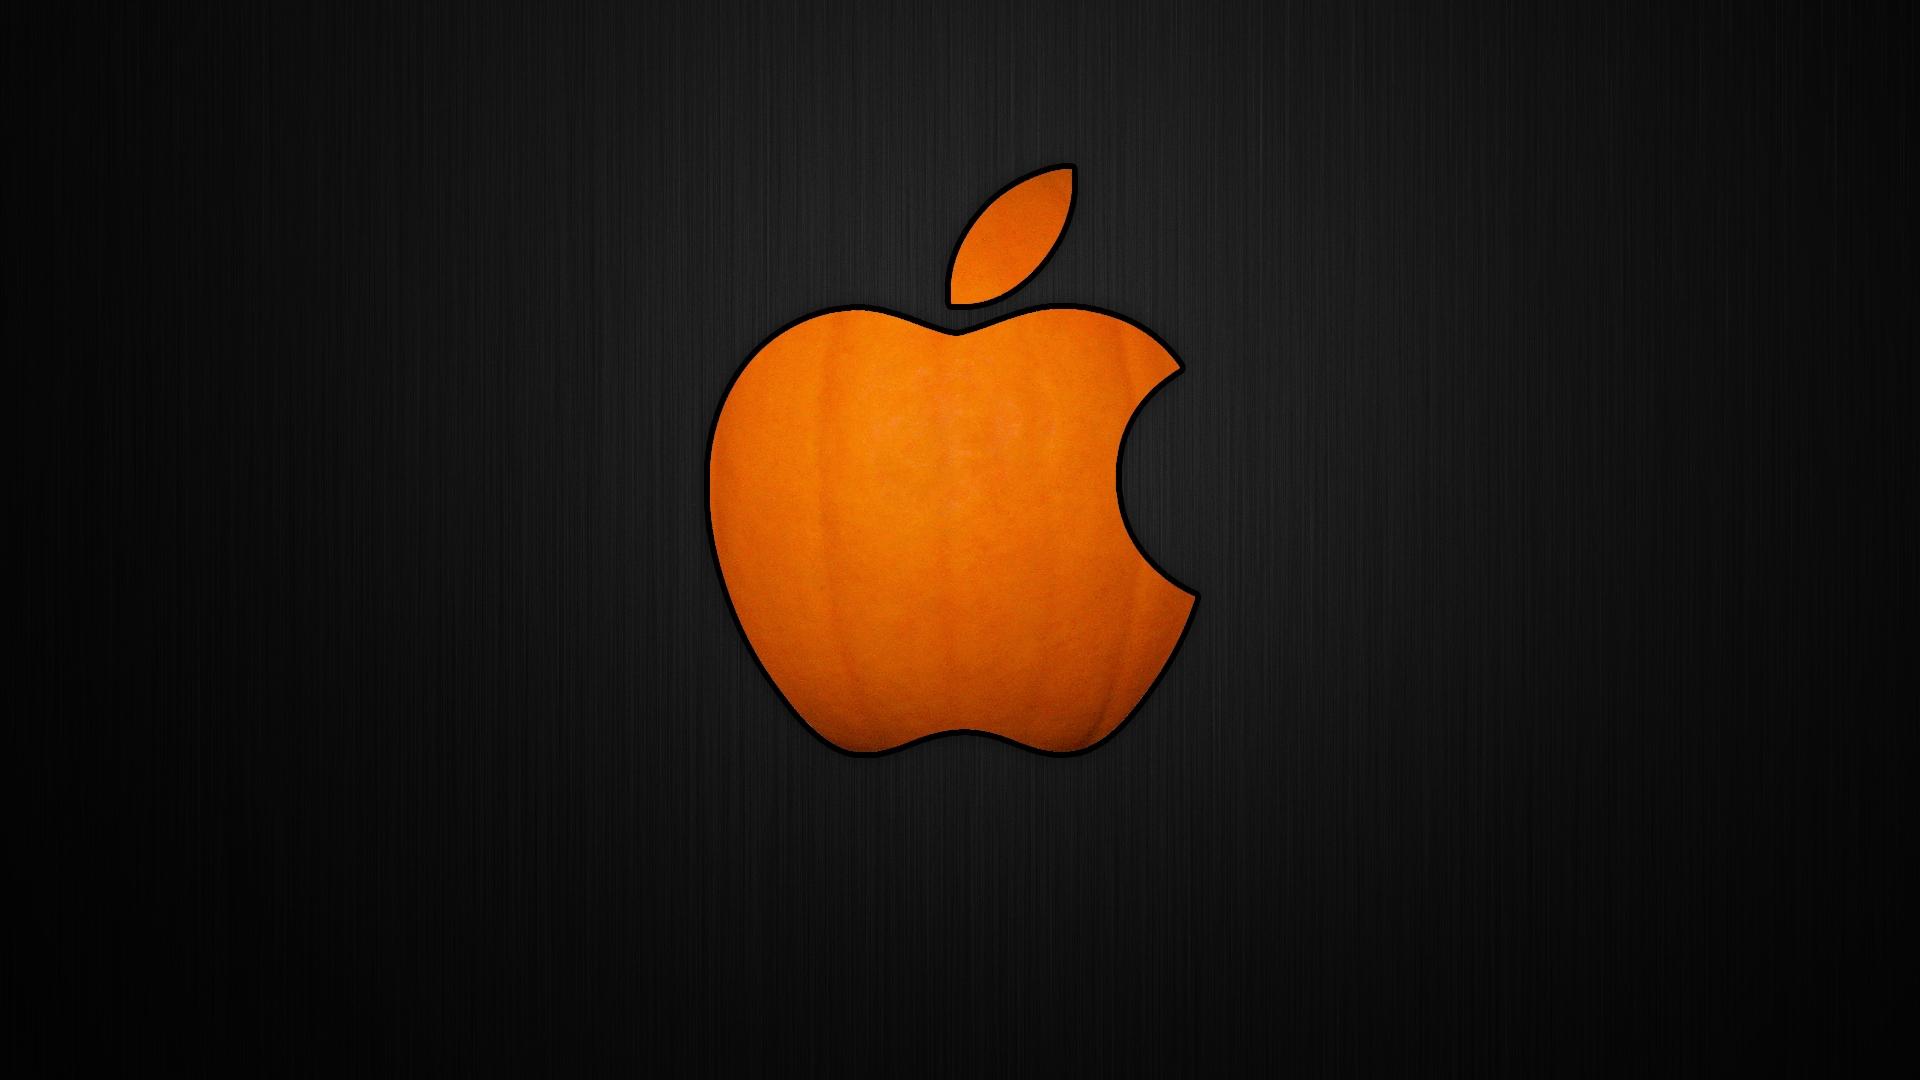 Cool Pumpkin Apple   High Definition Wallpapers   HD wallpapers 1920x1080